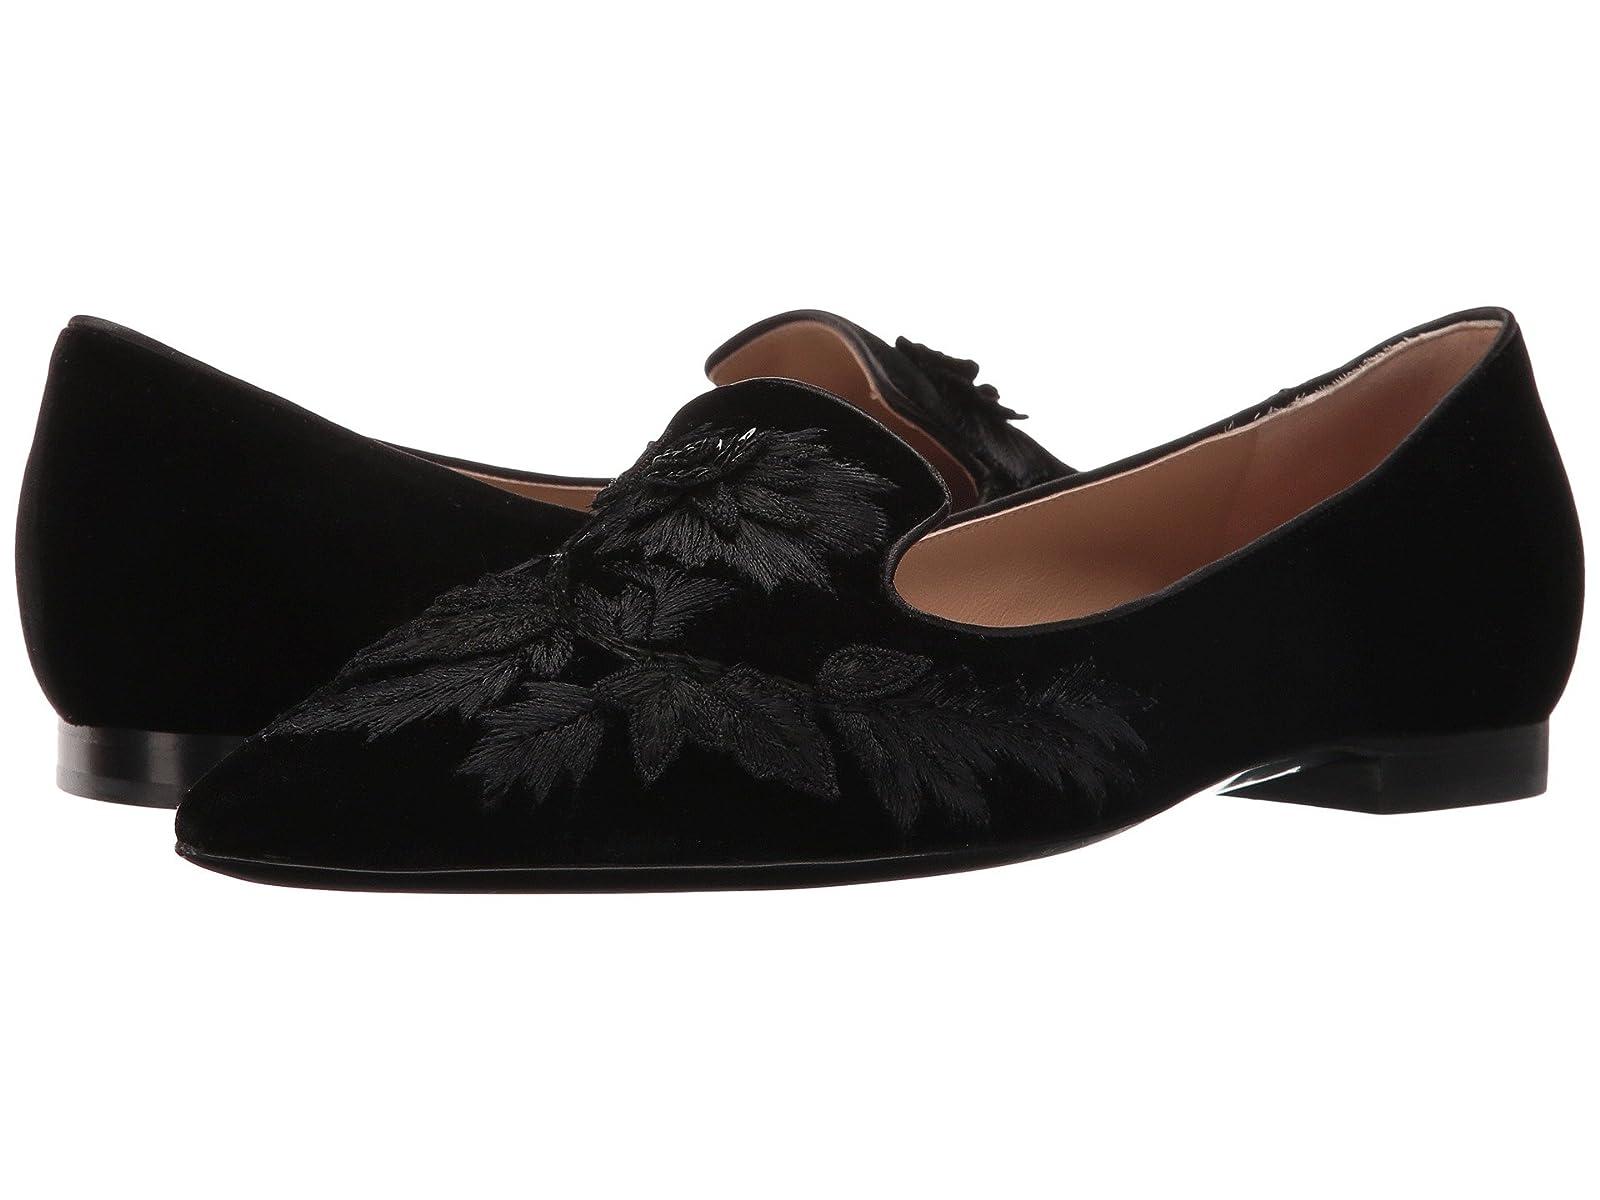 Alberta Ferretti Embroidered Slip-On FlatCheap and distinctive eye-catching shoes